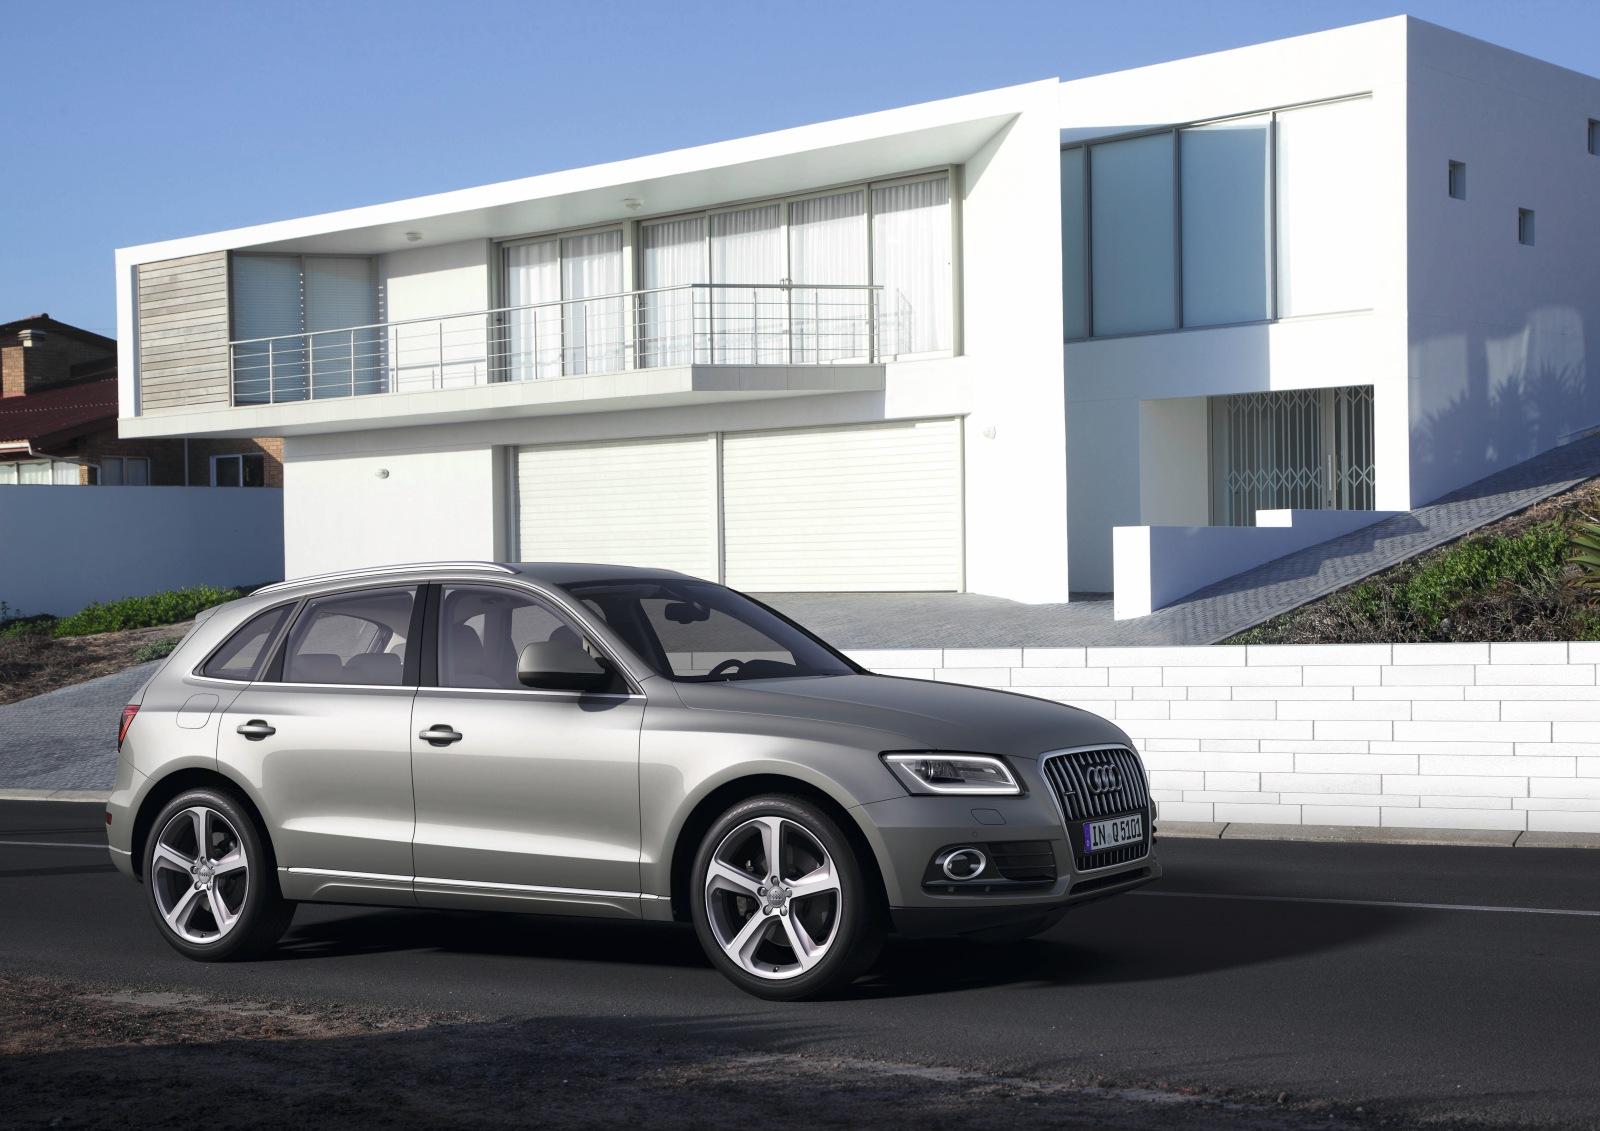 Audi muestra el remodelado Q5 2012